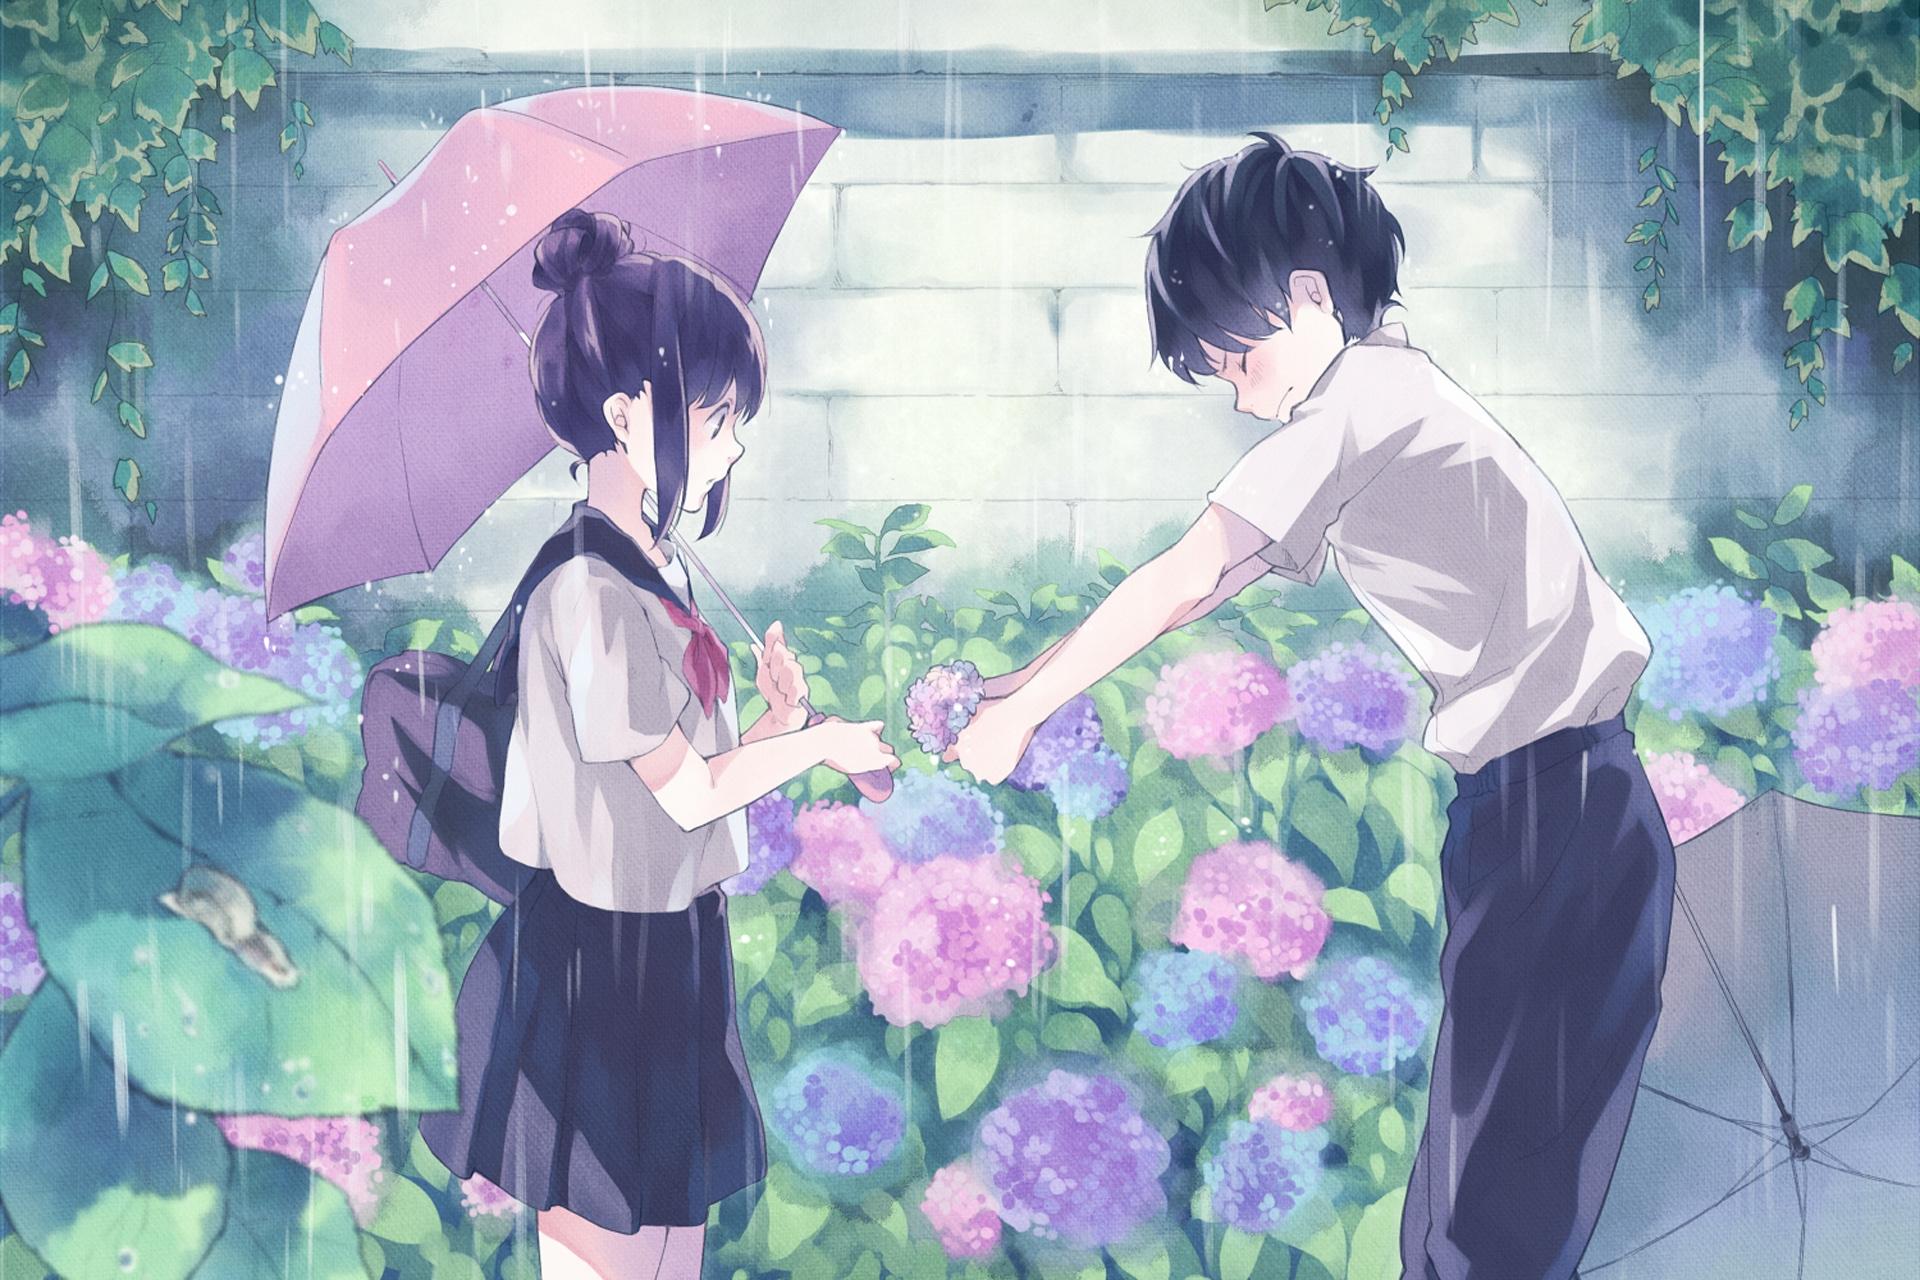 Anime Boy And Girl anime boy wallpapers hd - anime boy confessing to girl